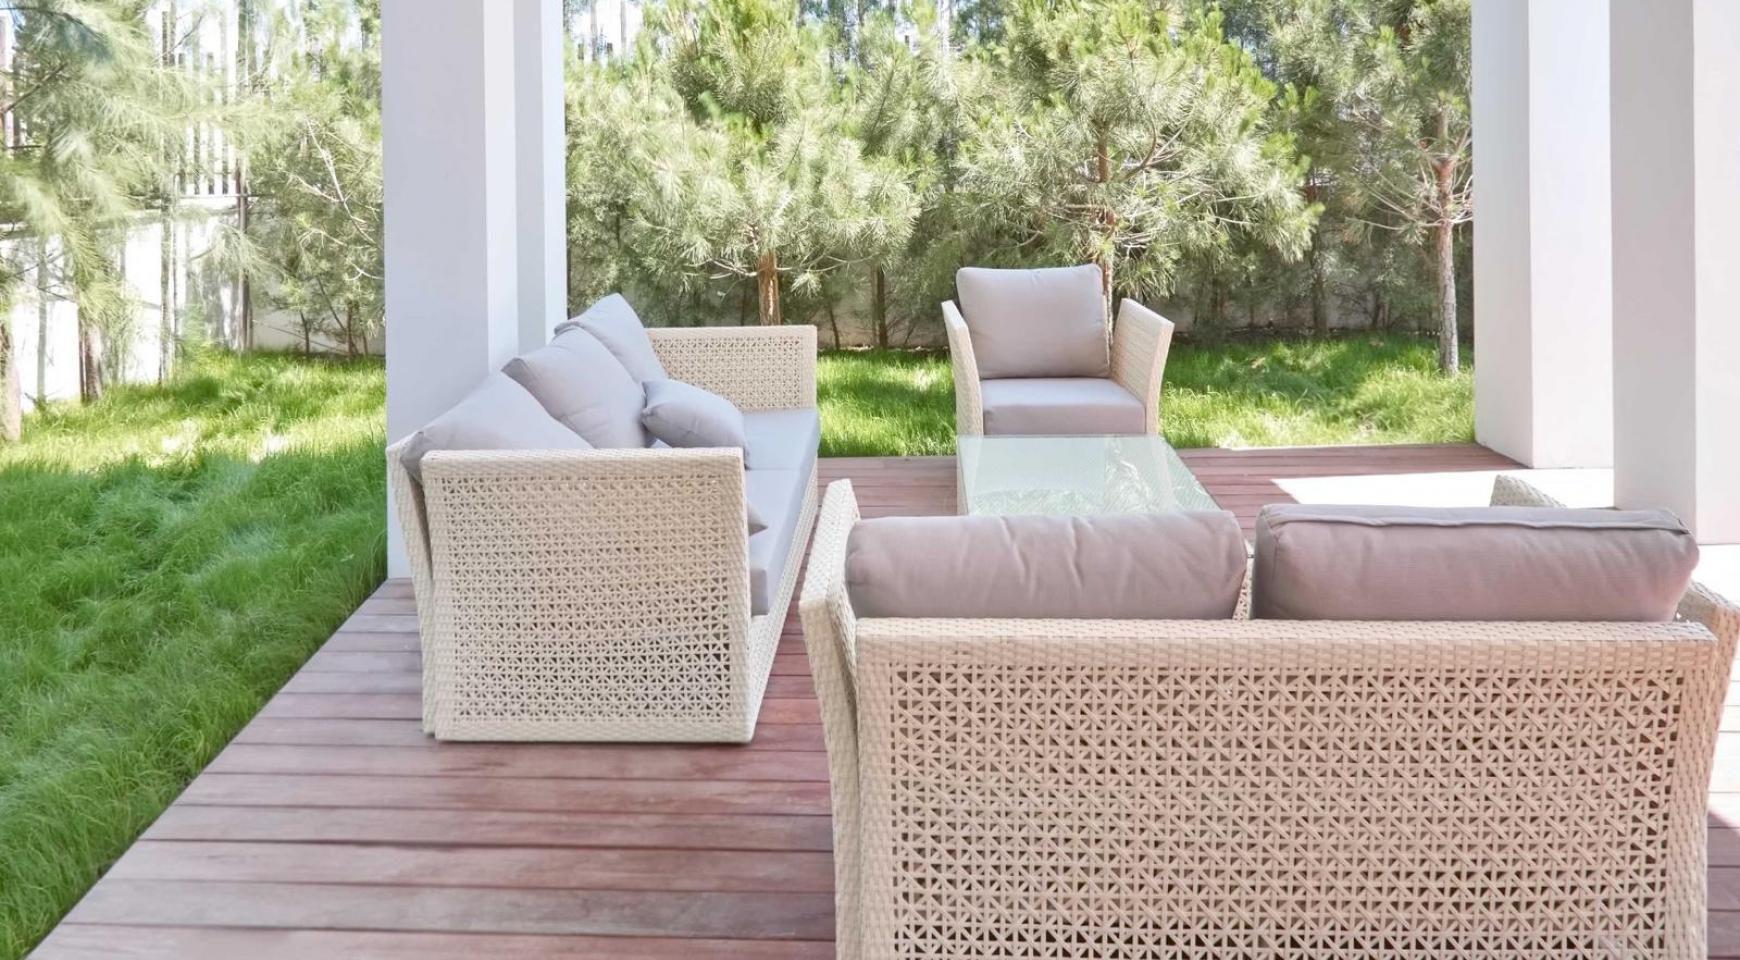 New Luxurious 4 Bedroom Villa in the Tourist Area - 7